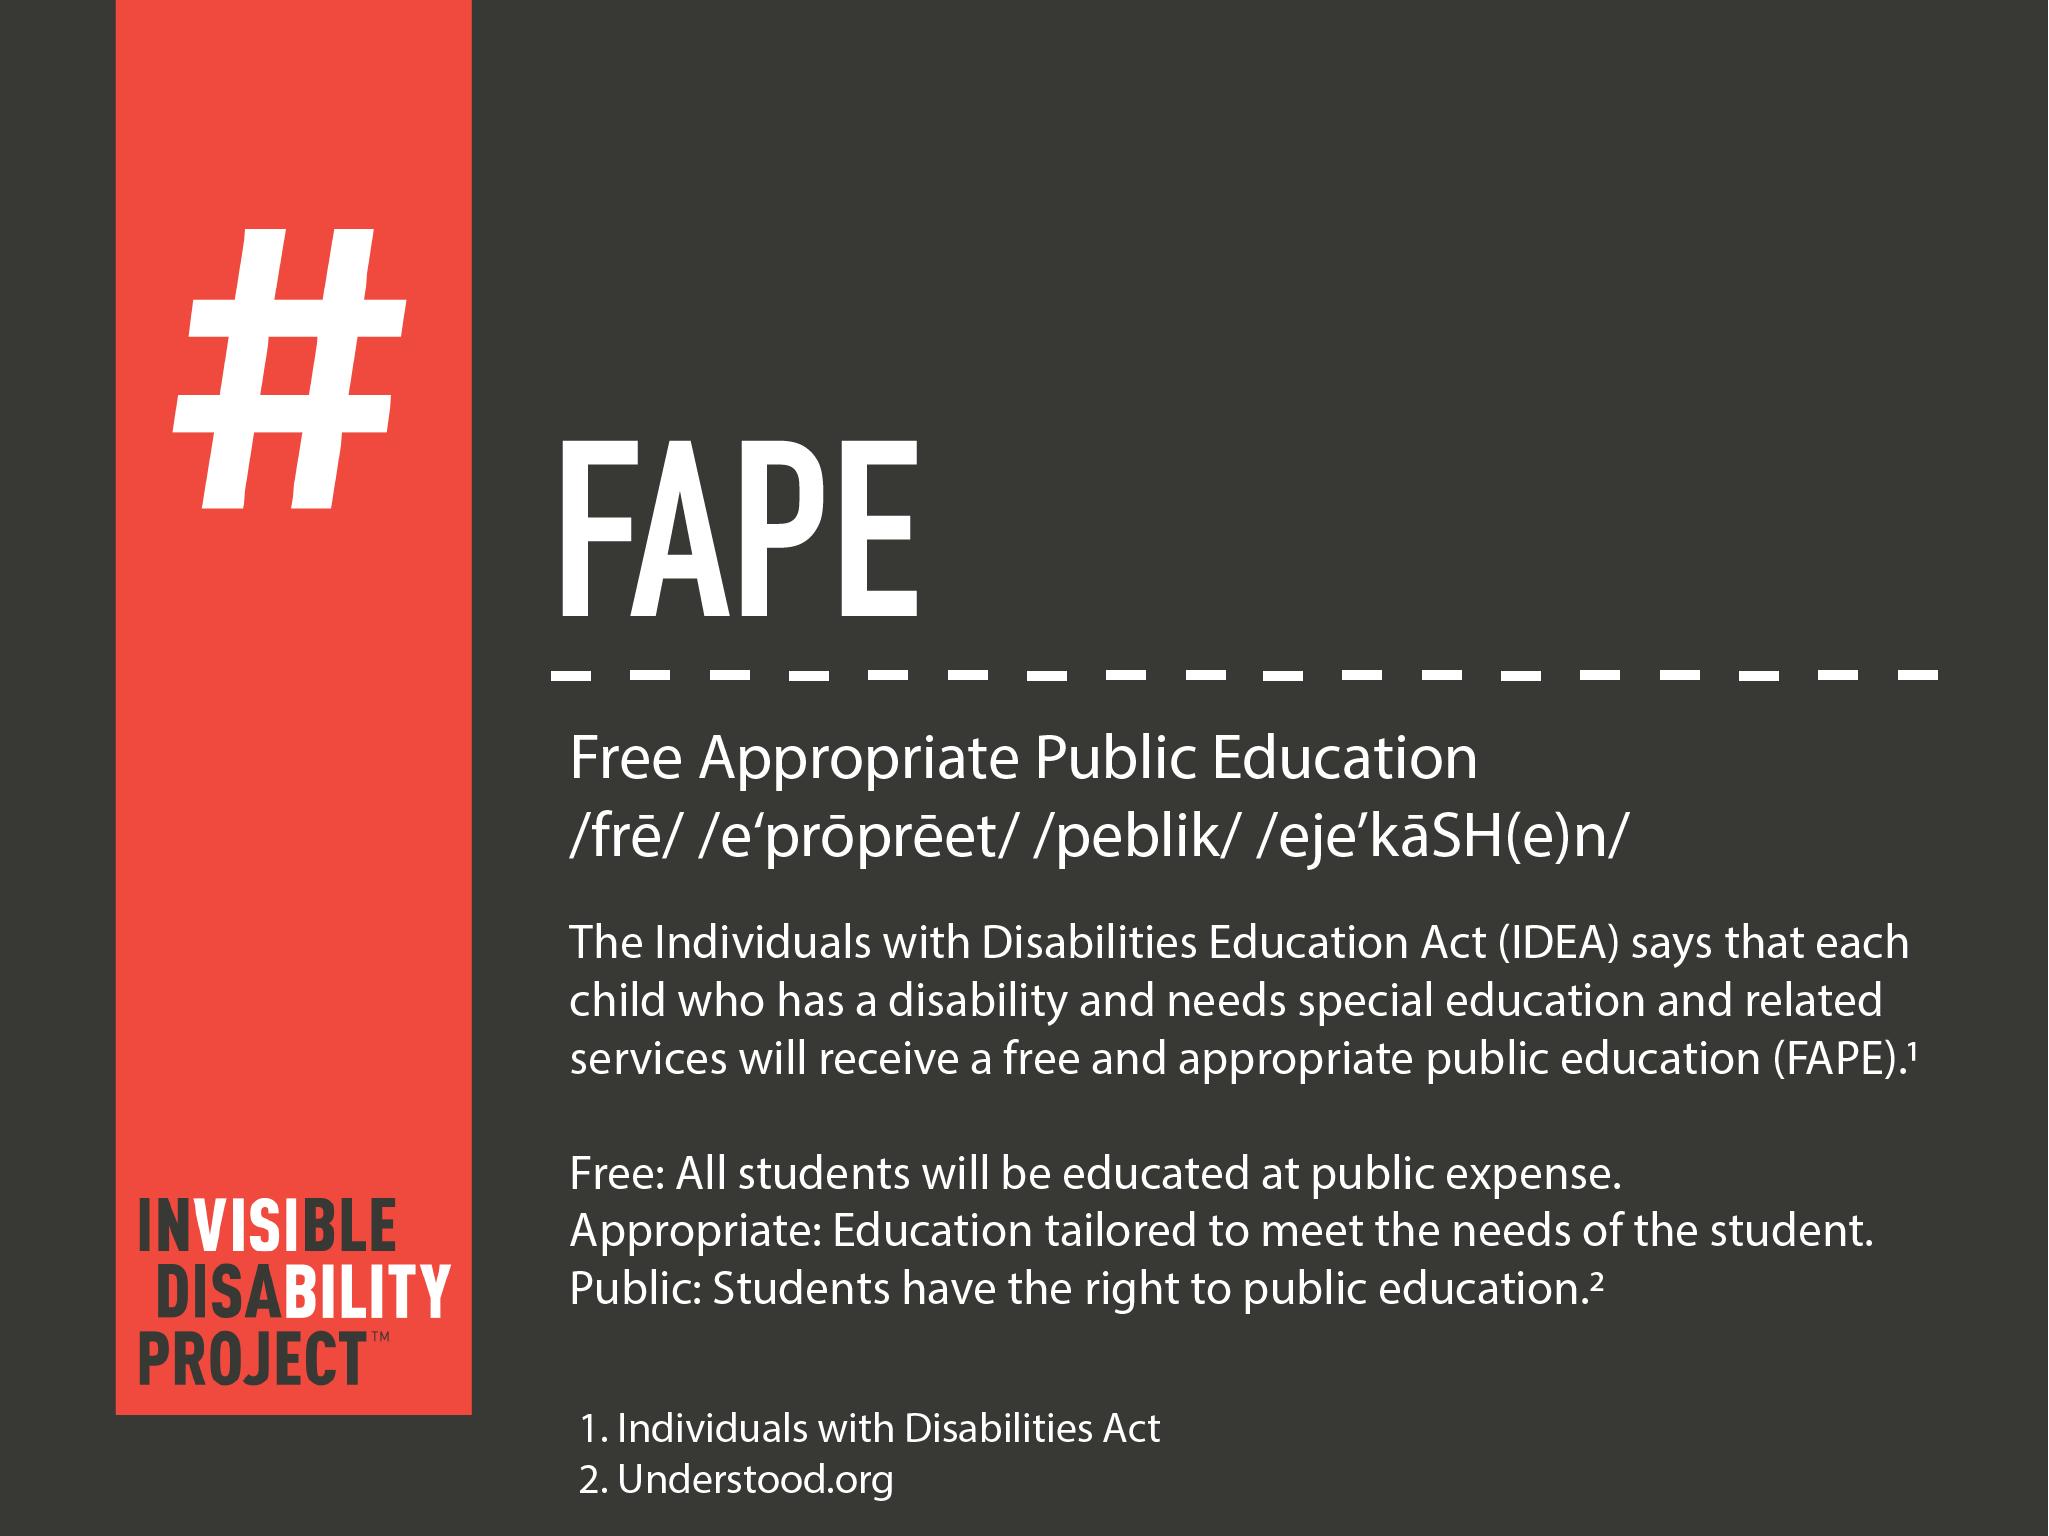 FAPE: Free Appropriate Public Education